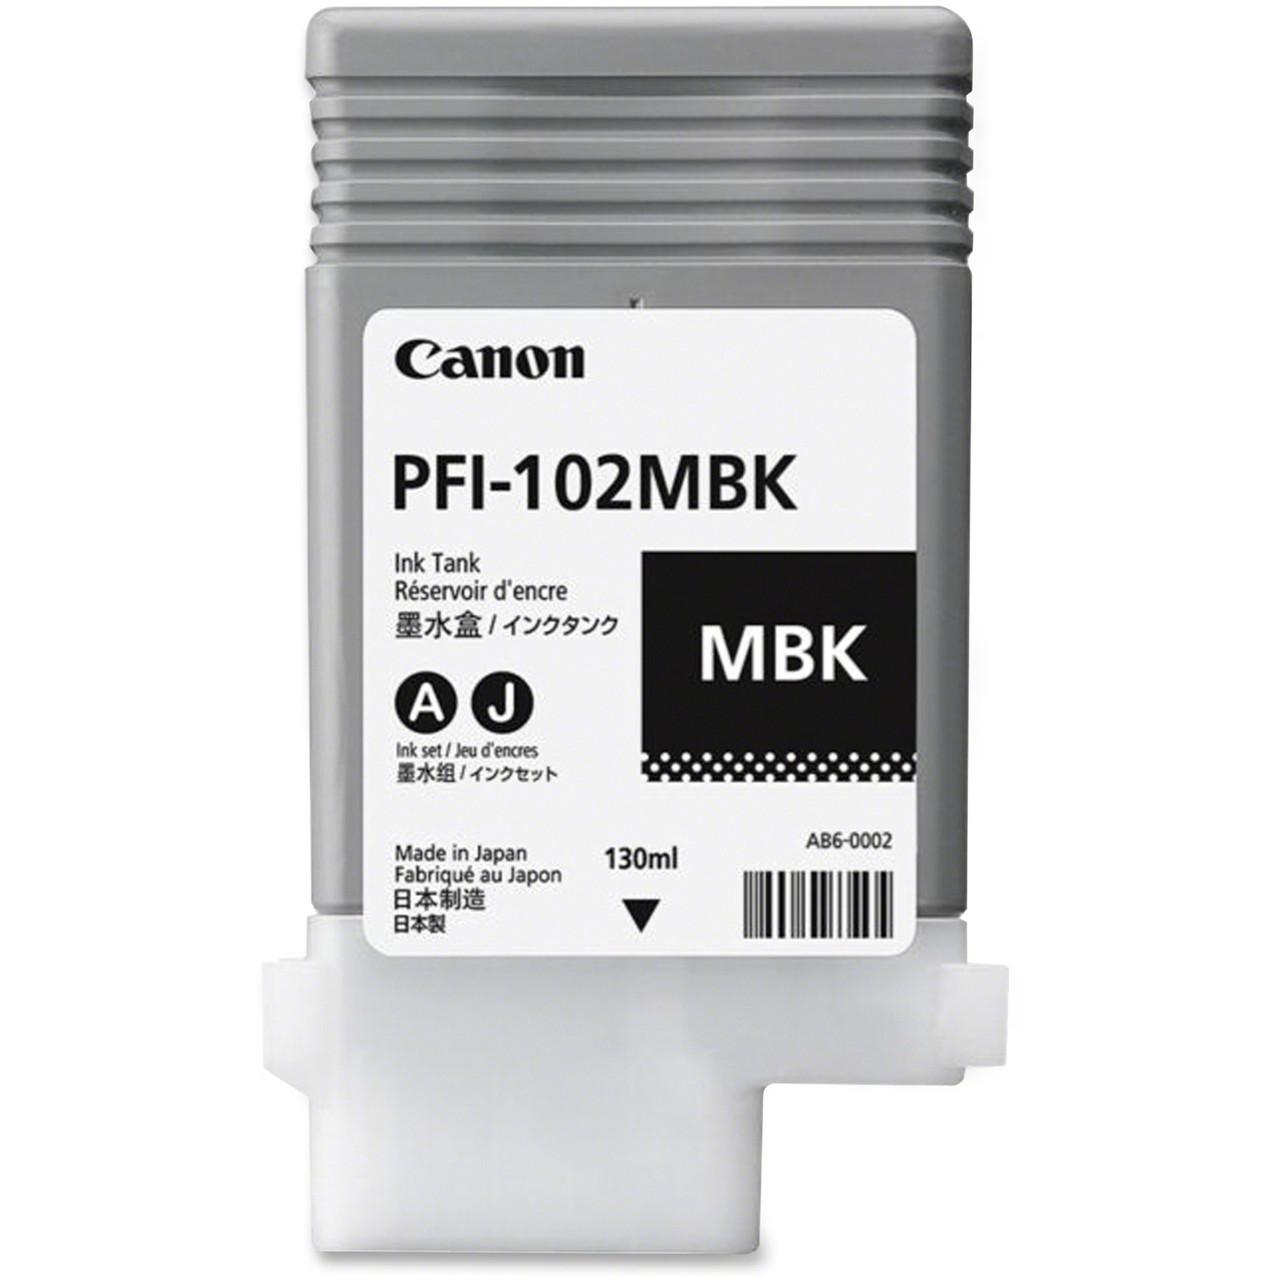 Картридж Canon PFI-102MBK для iPF500/600/700, Matte Black, 130 мл